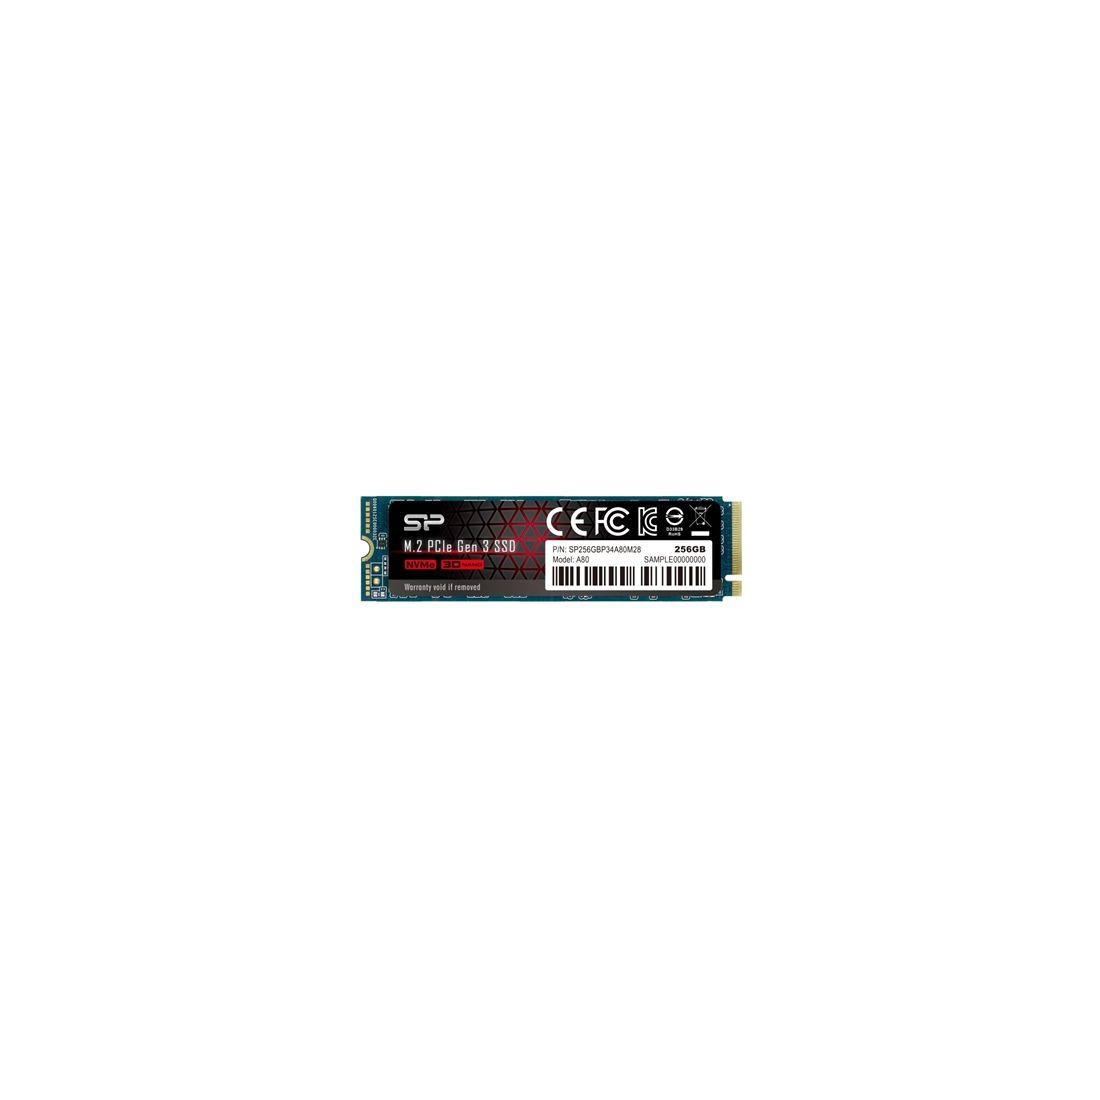 SP Ace A80 SSD NVMe 256GB